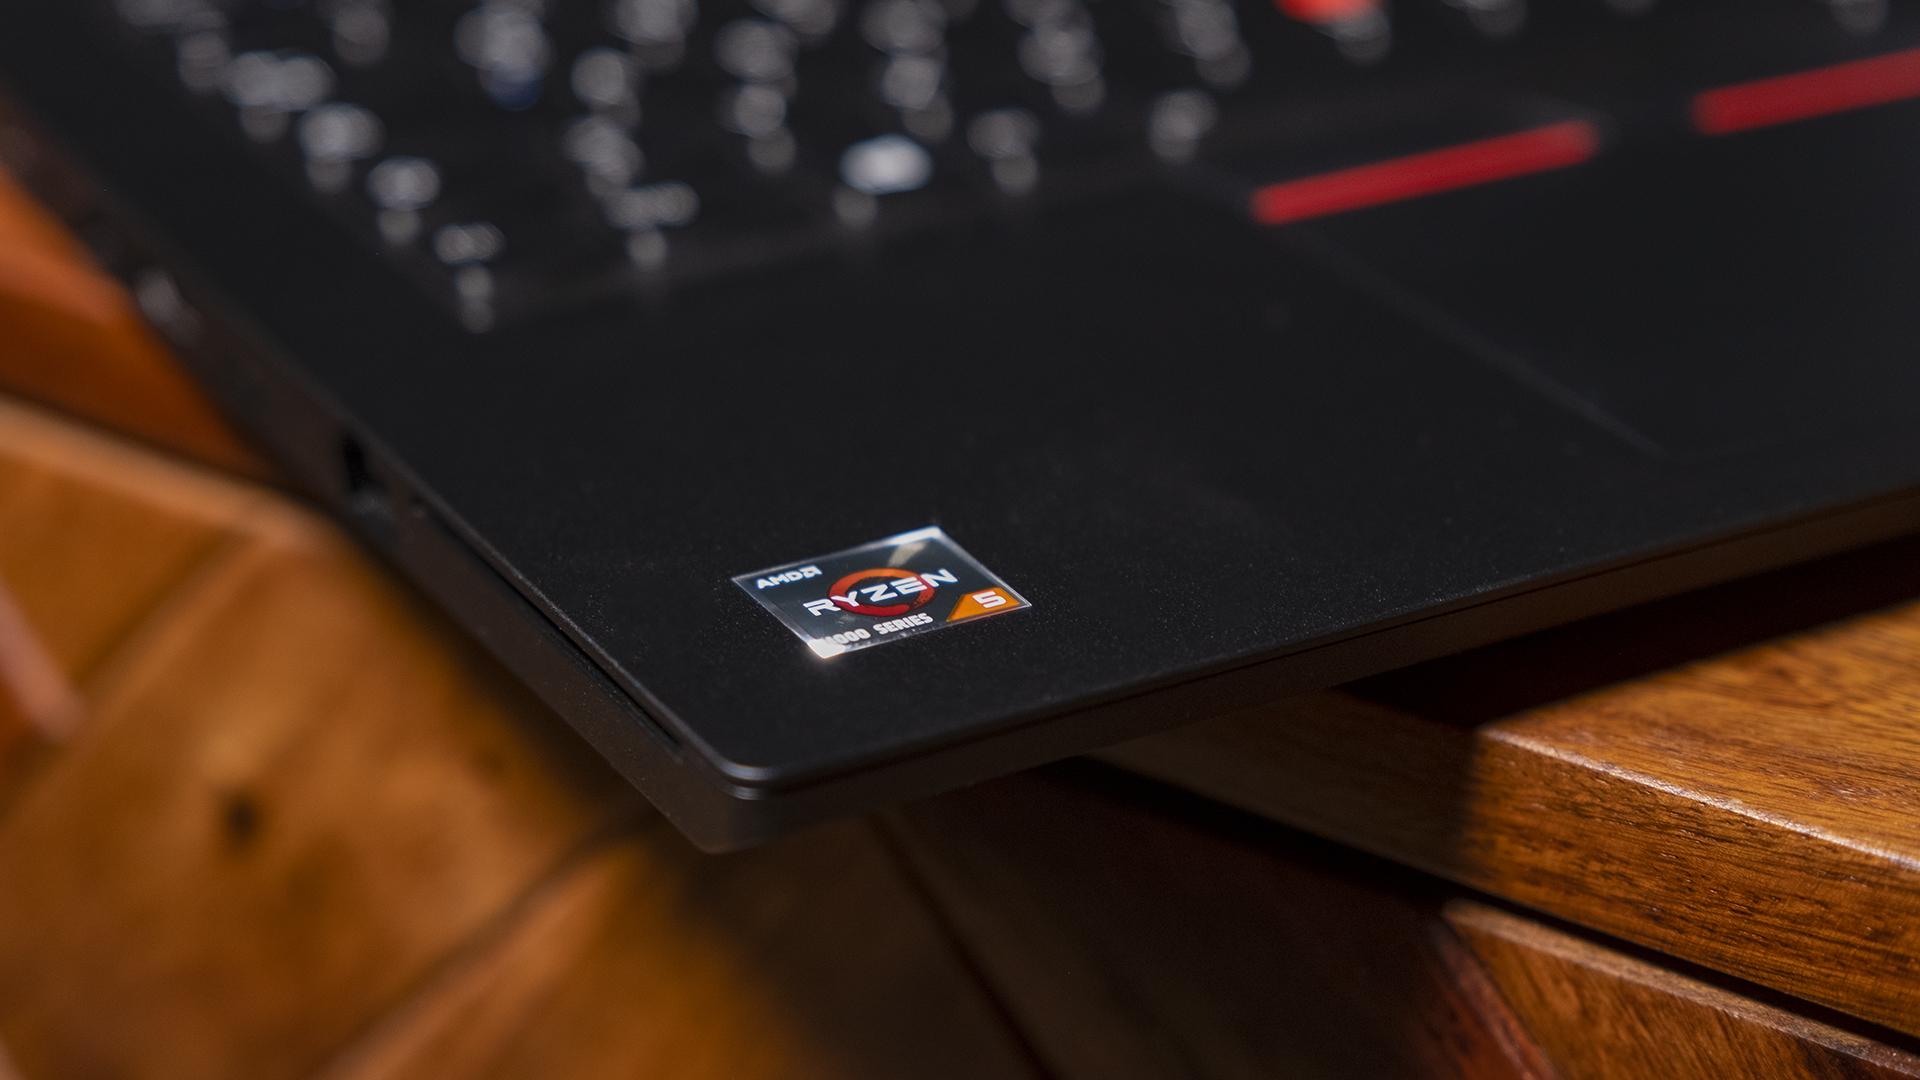 Lenovo ThinkPad L14 AMD Ryzen 5 4500U